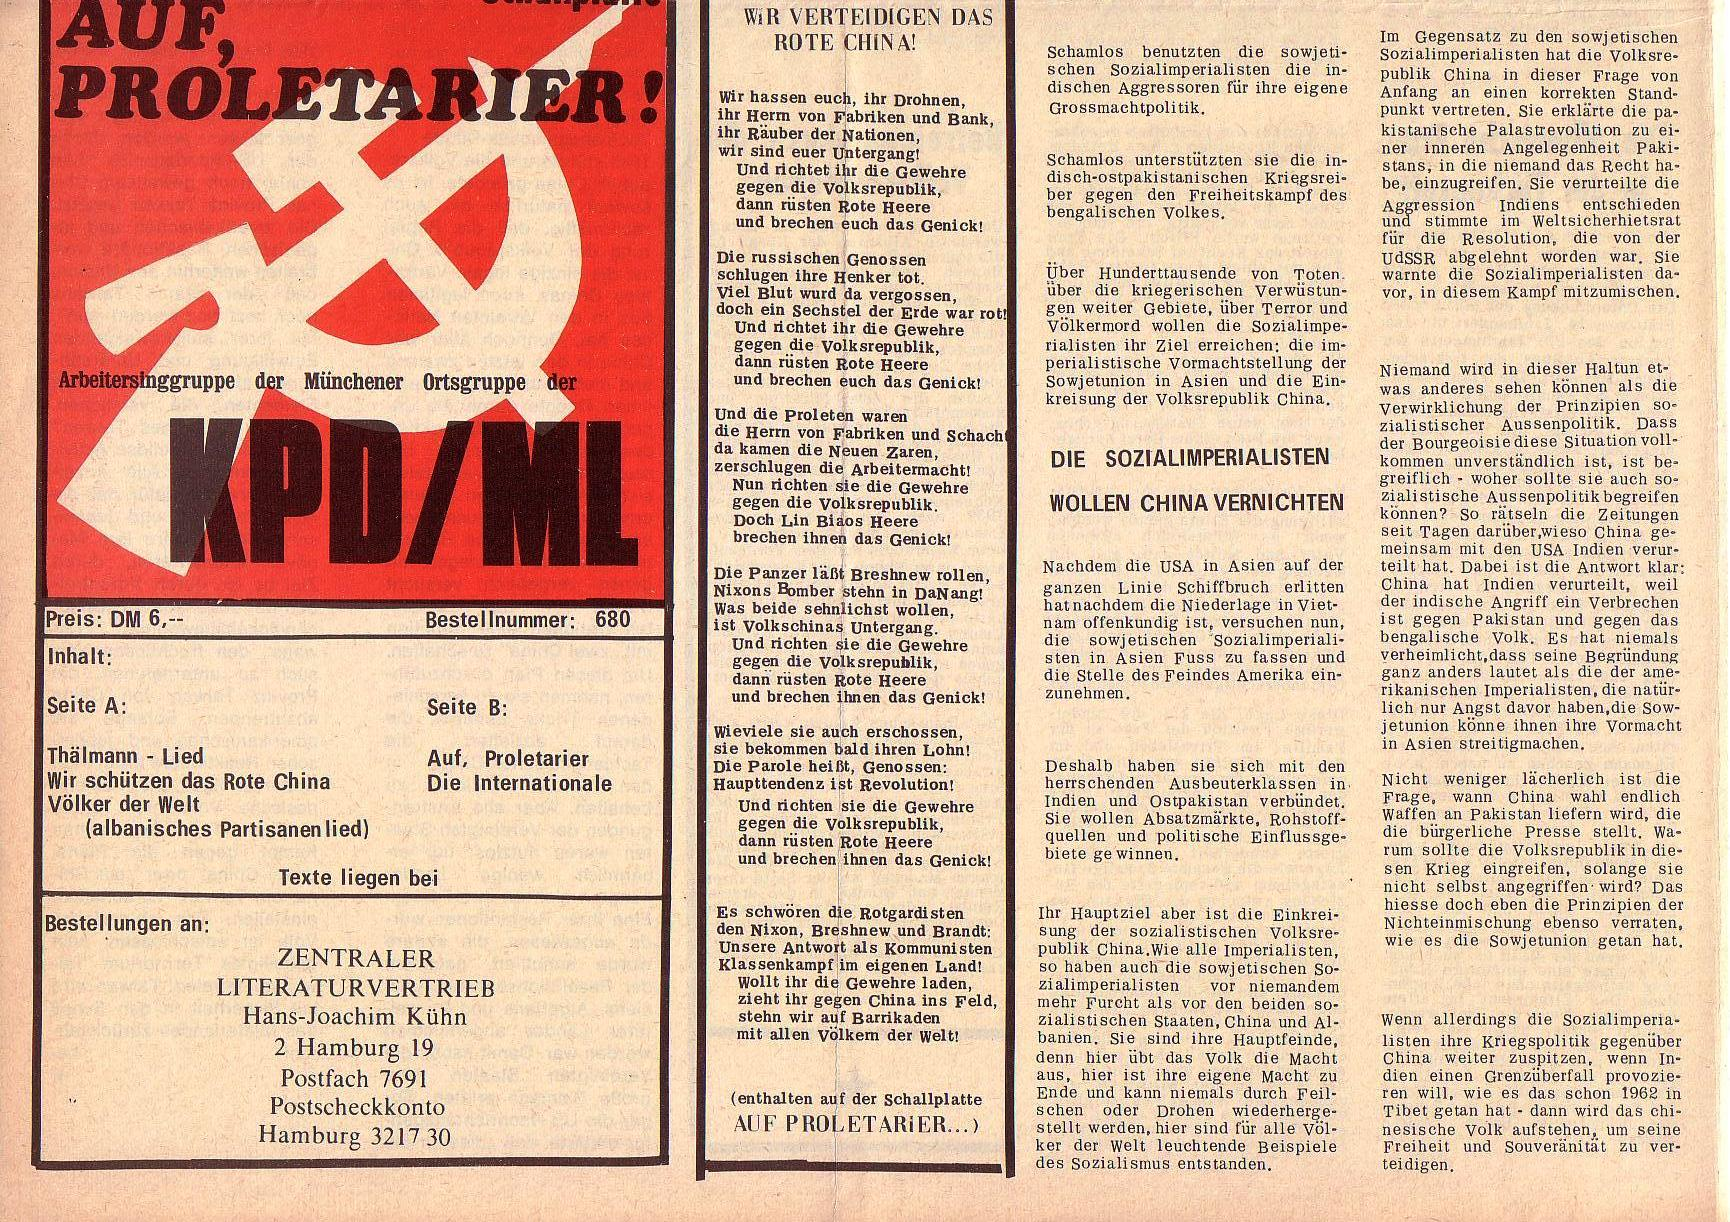 Roter Morgen, 5. Jg., 27. Dezember 1971, Nr. 16, Seite 8b